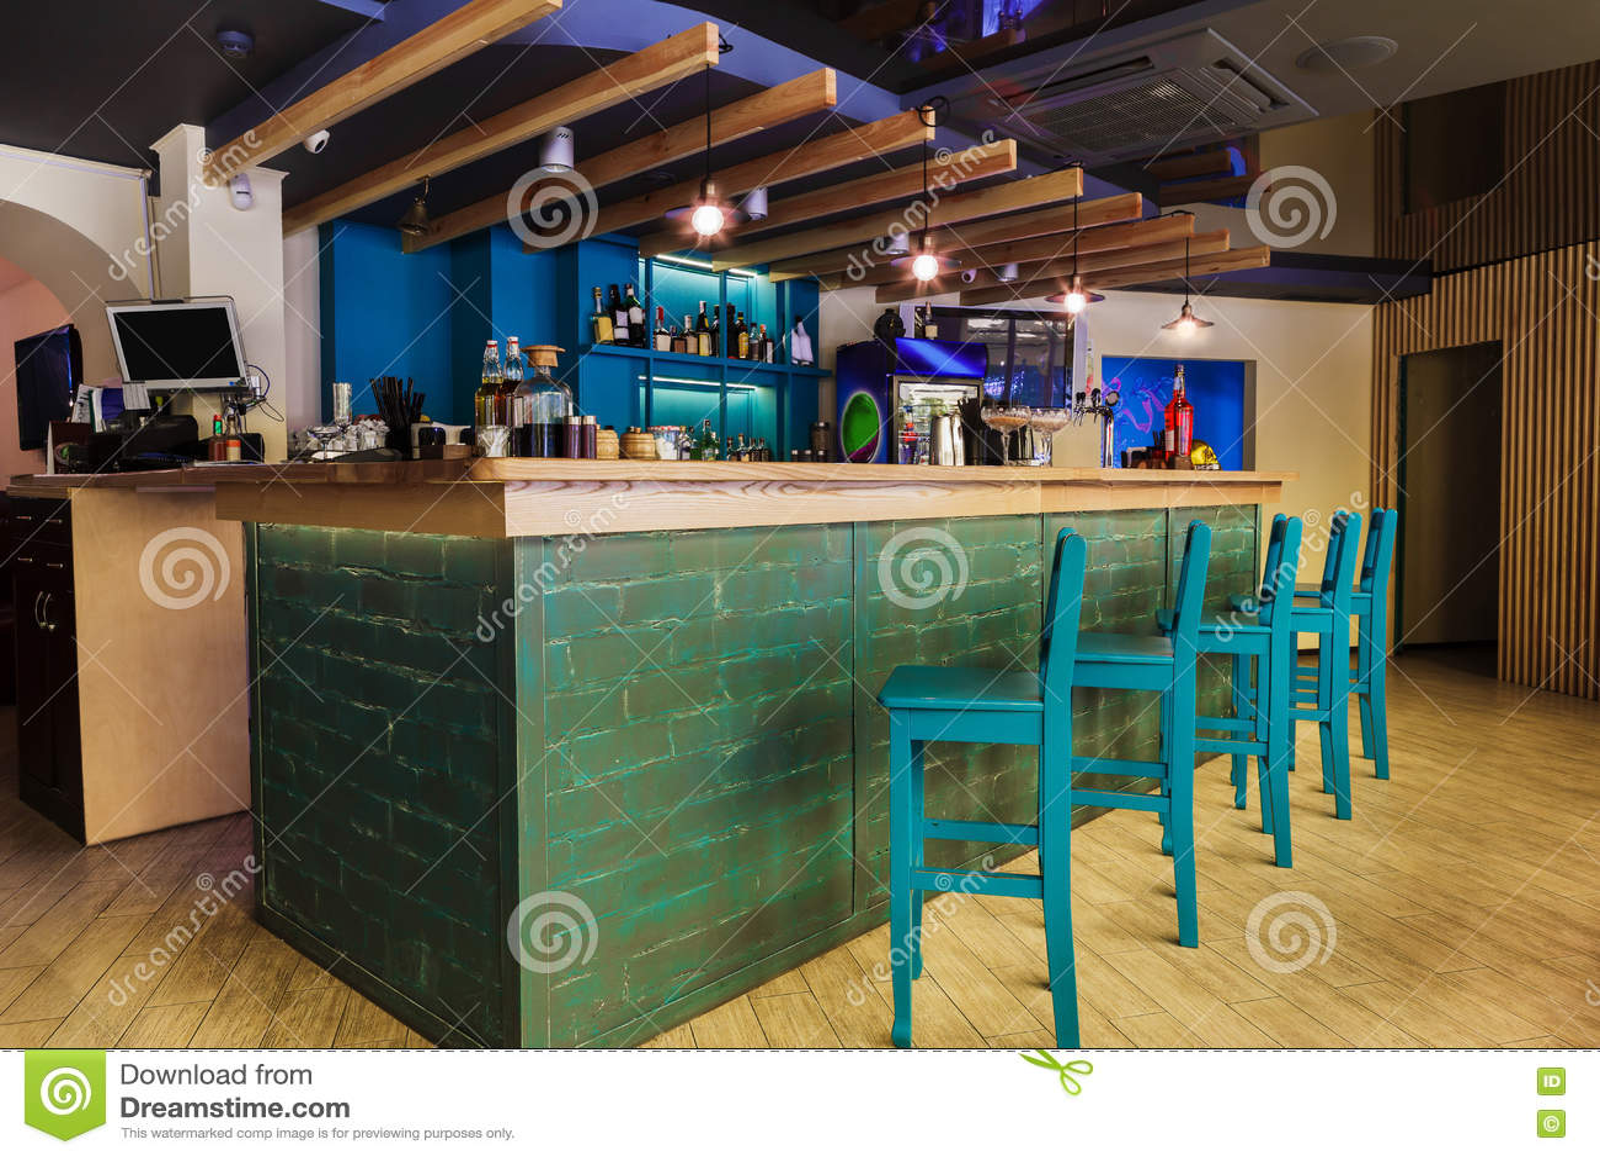 Modern Restaurant Bar Or Cafe Interior Stock Photo Image Of Furniture Inside 78542328